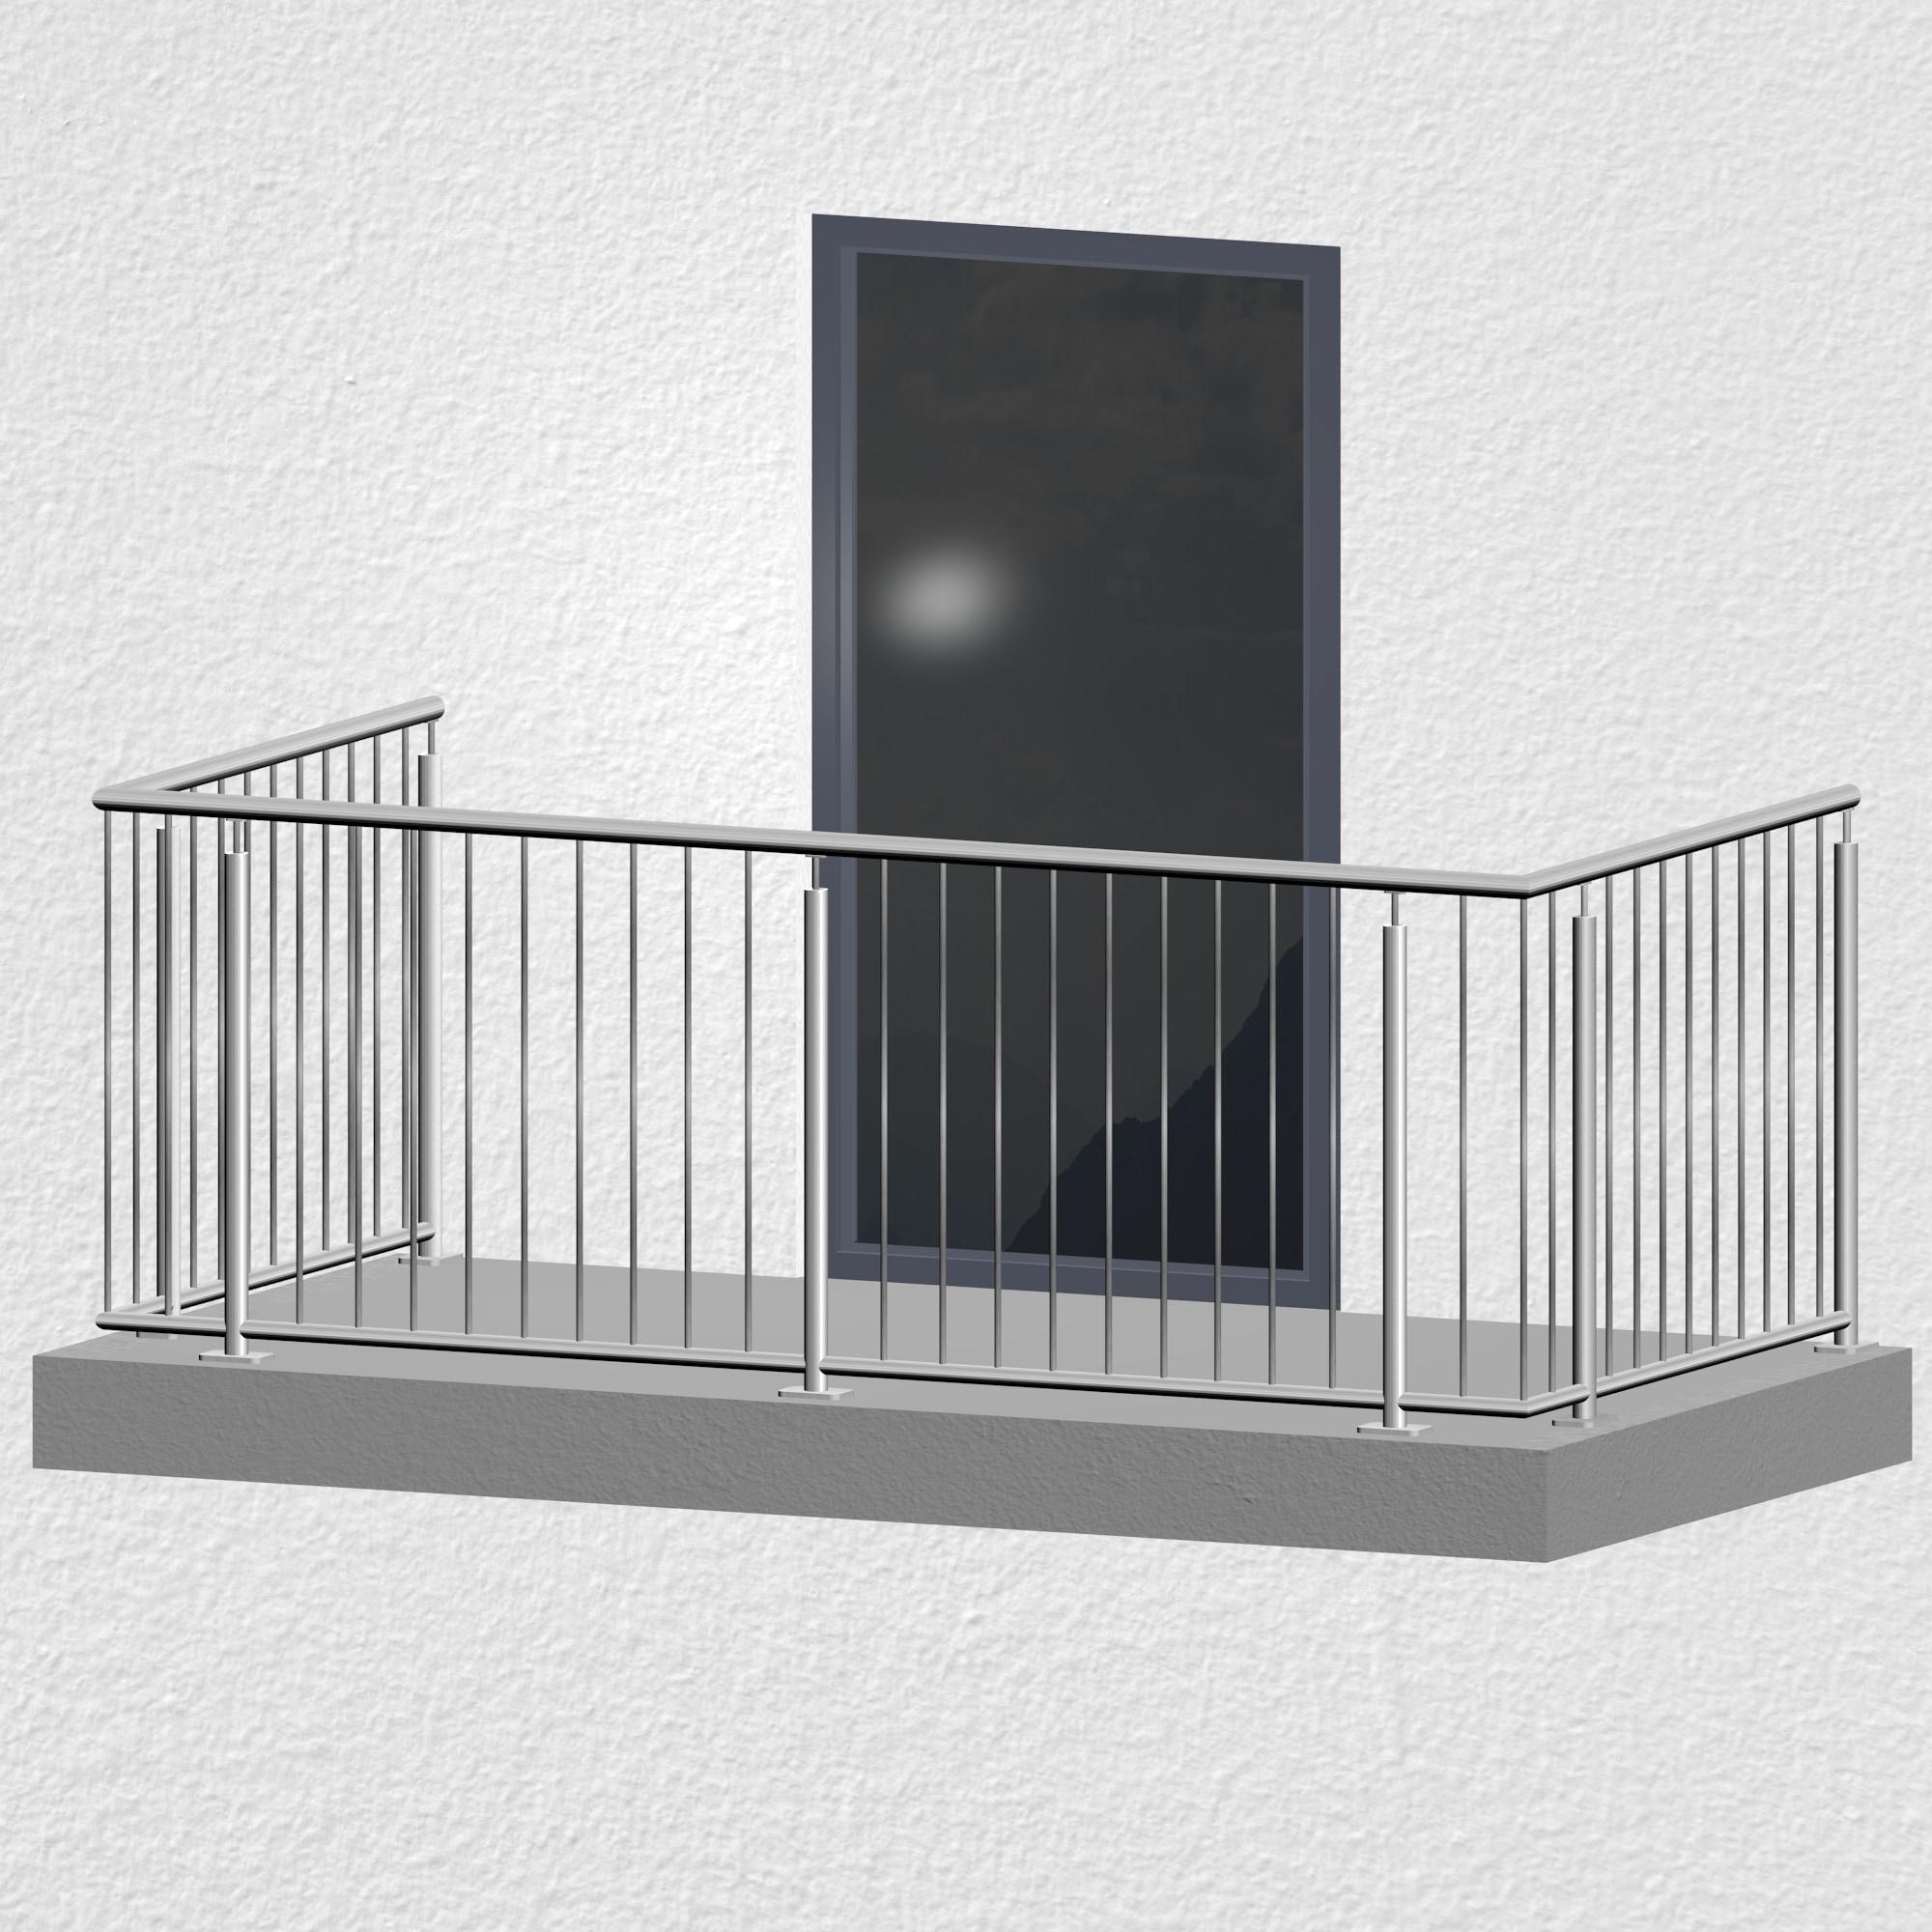 Balkongeländer Edelstahl Standard Modern